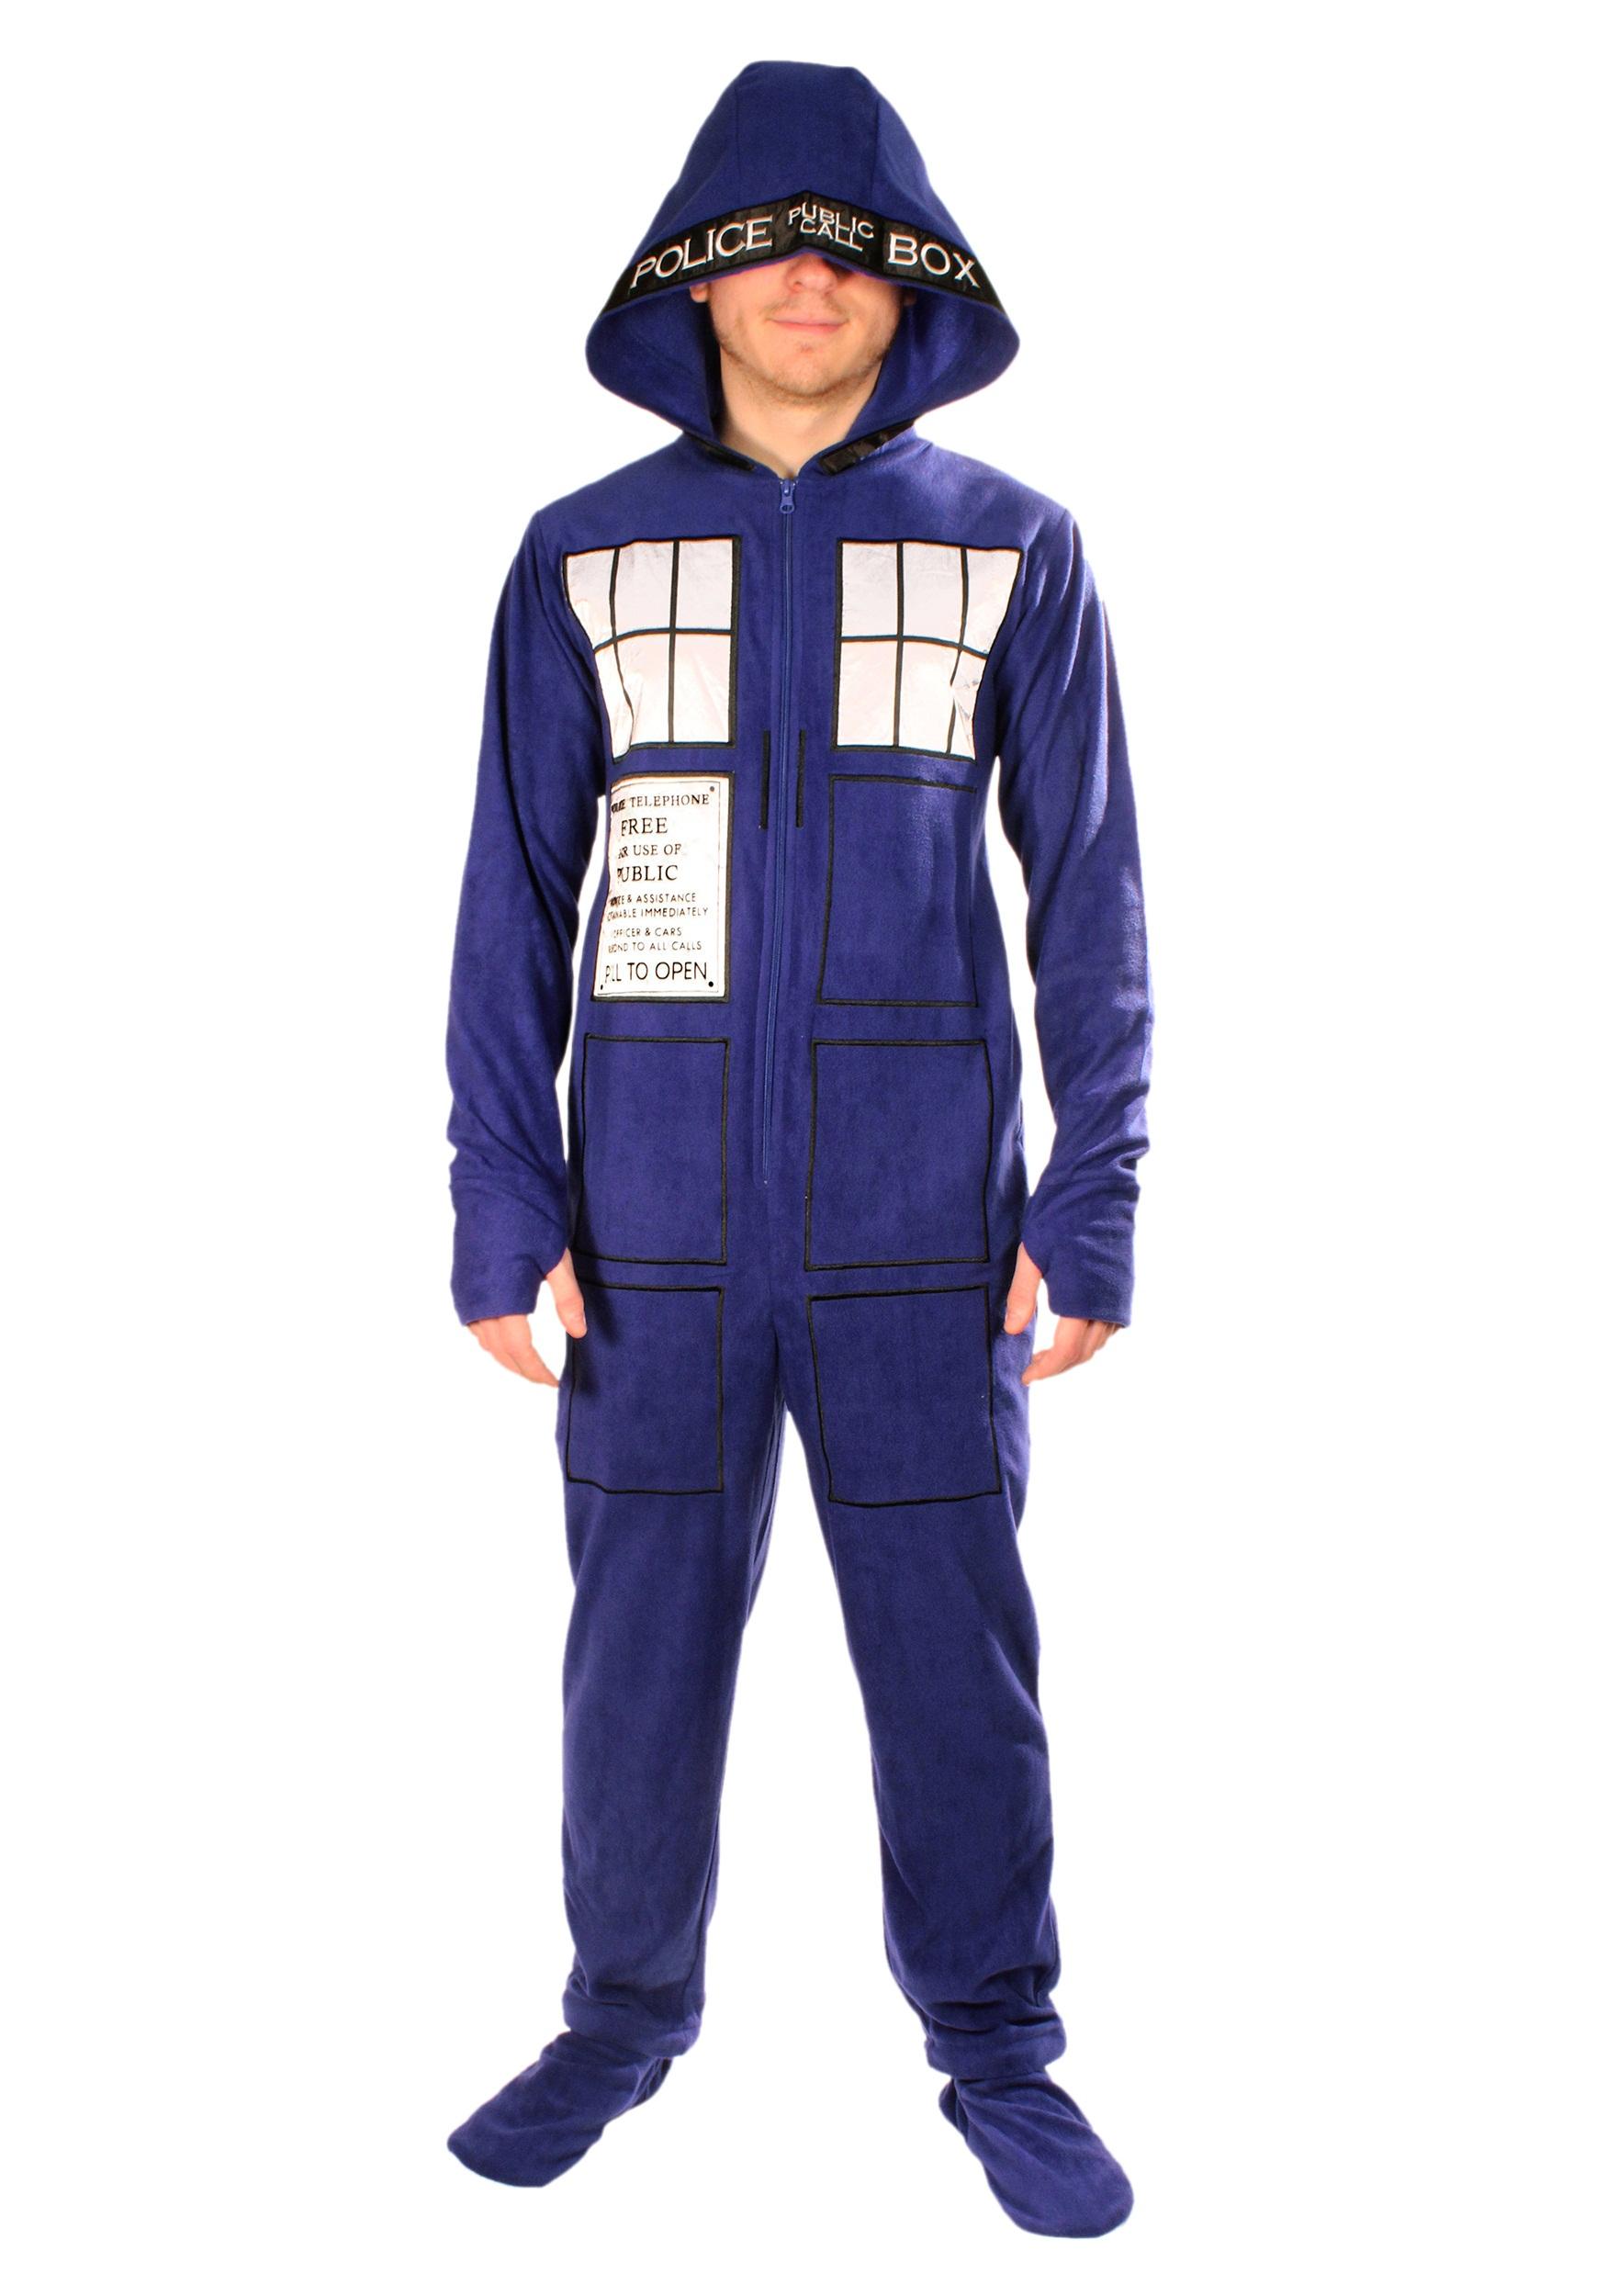 doctor who costumes - halloweencostumes